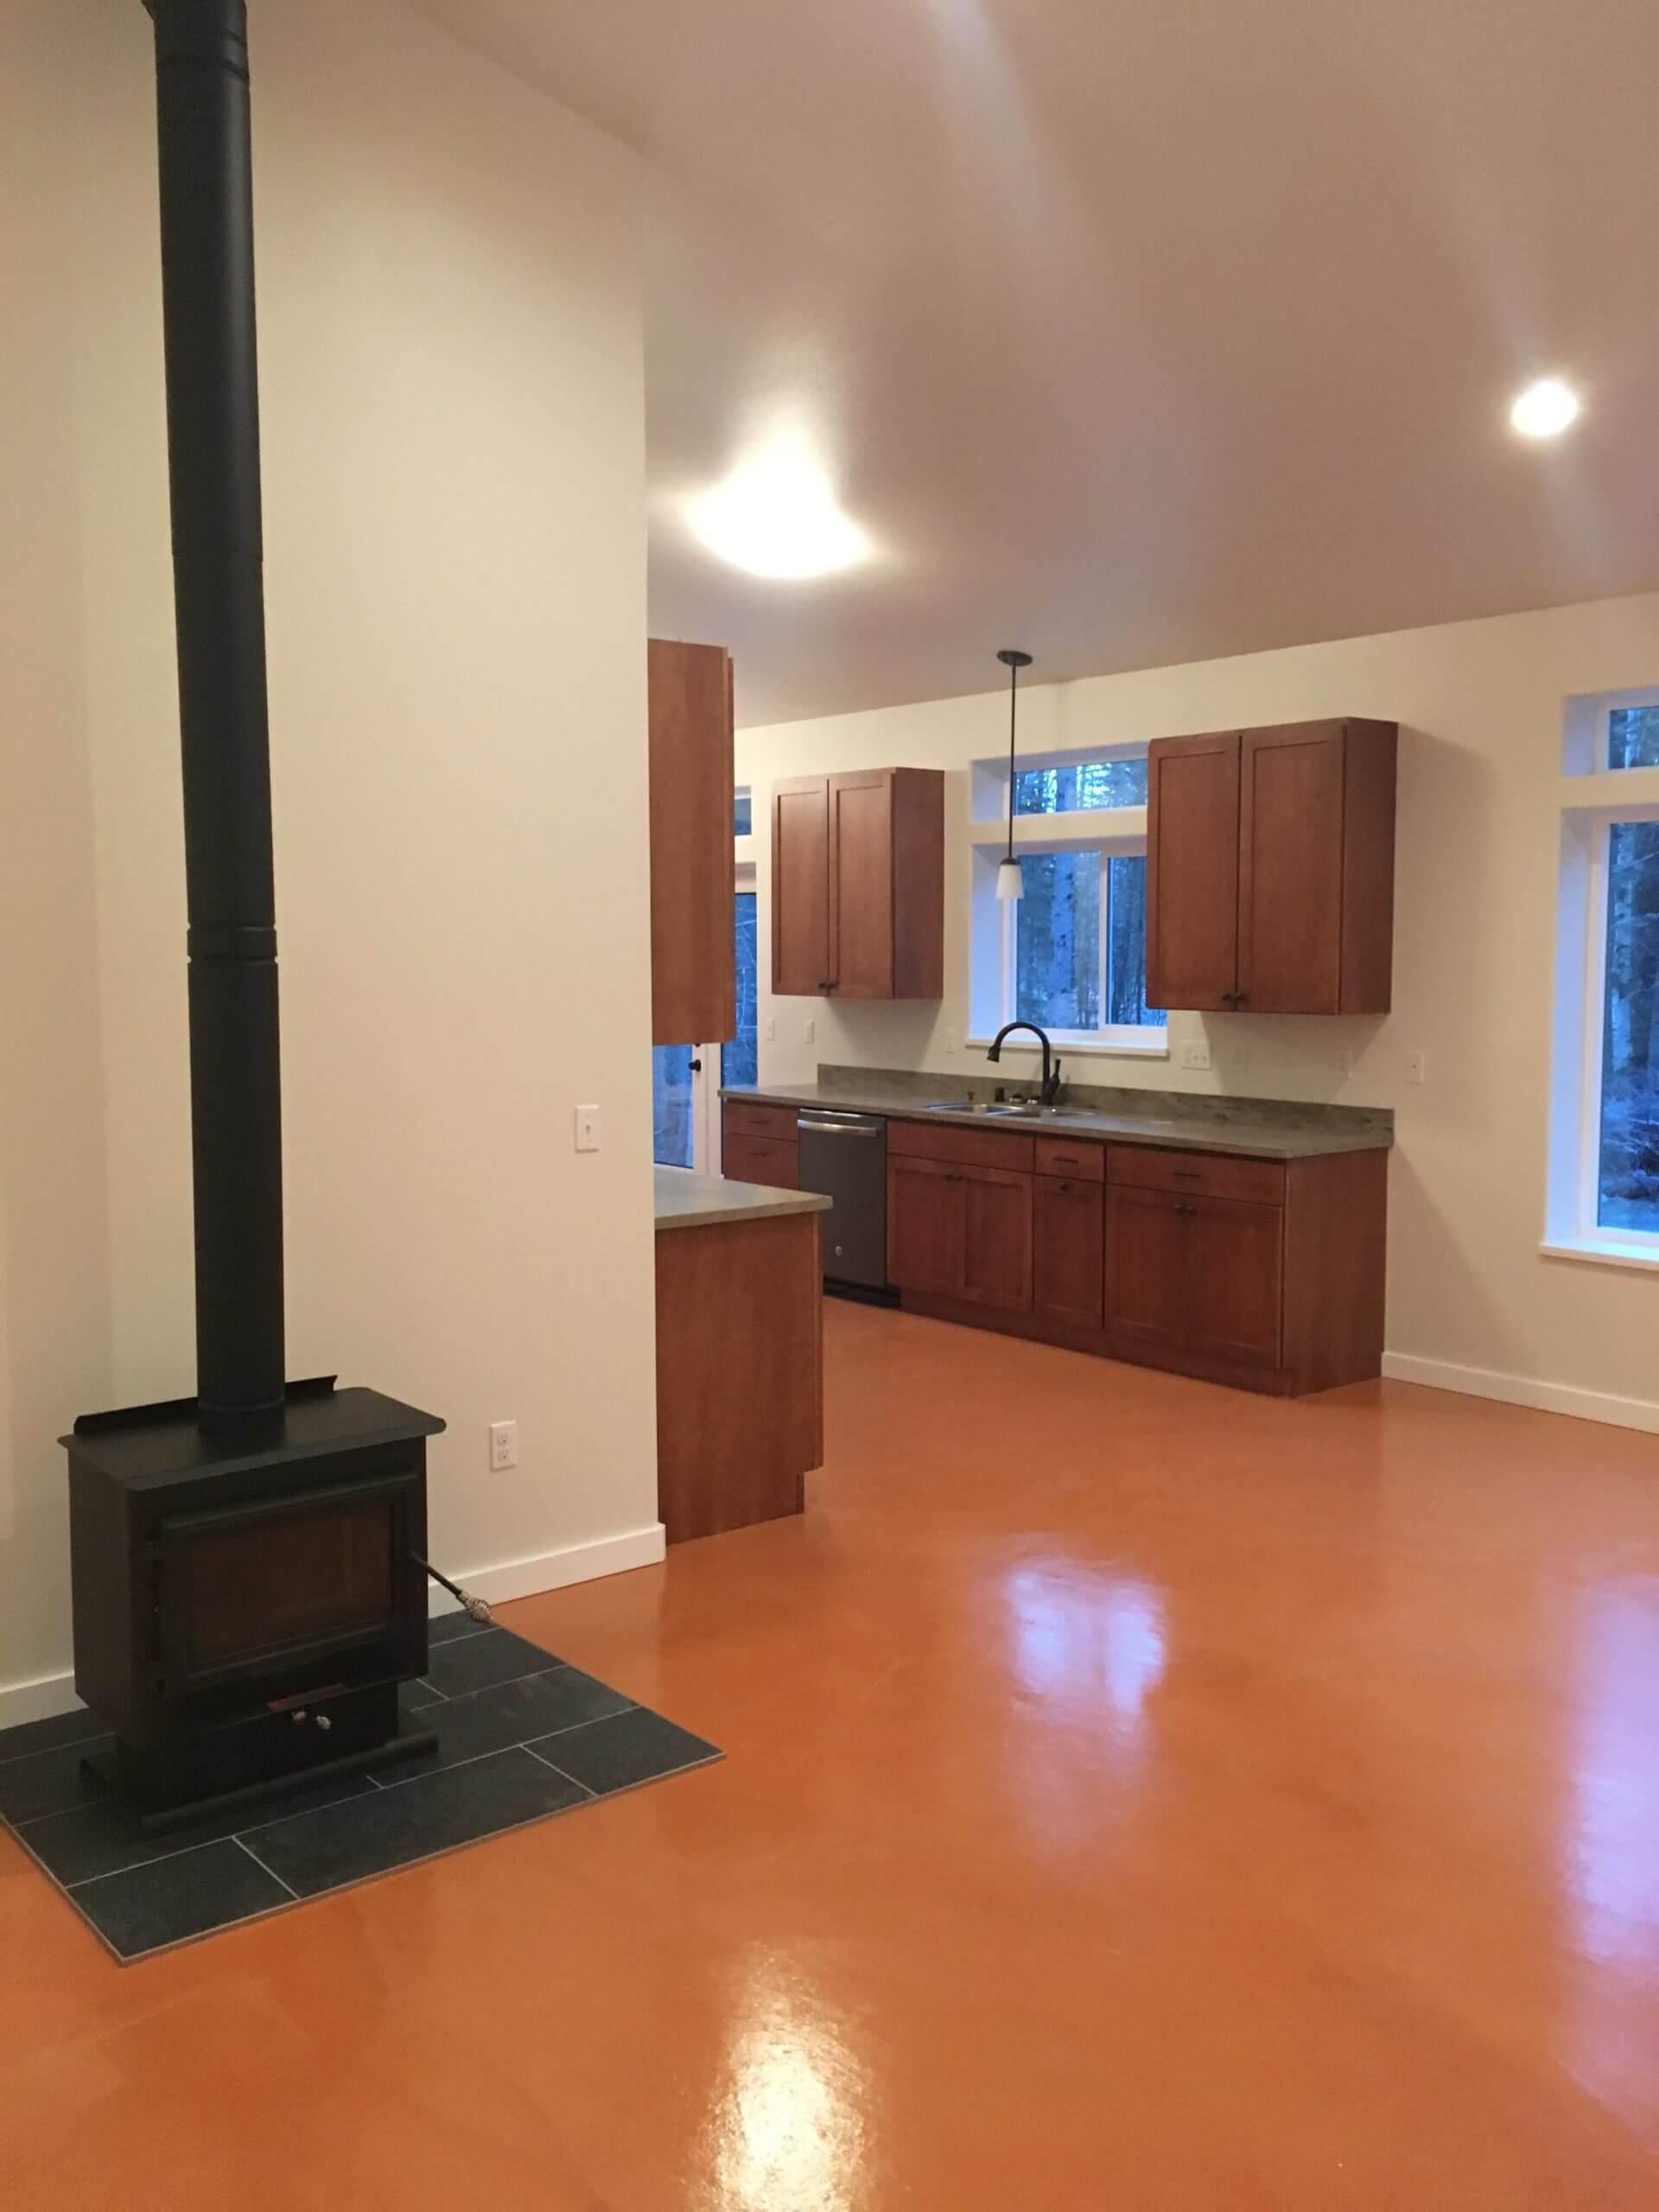 nbspBasement Flooring Options NY NJ CT PA MA | Duraamen Engineered Products Inc